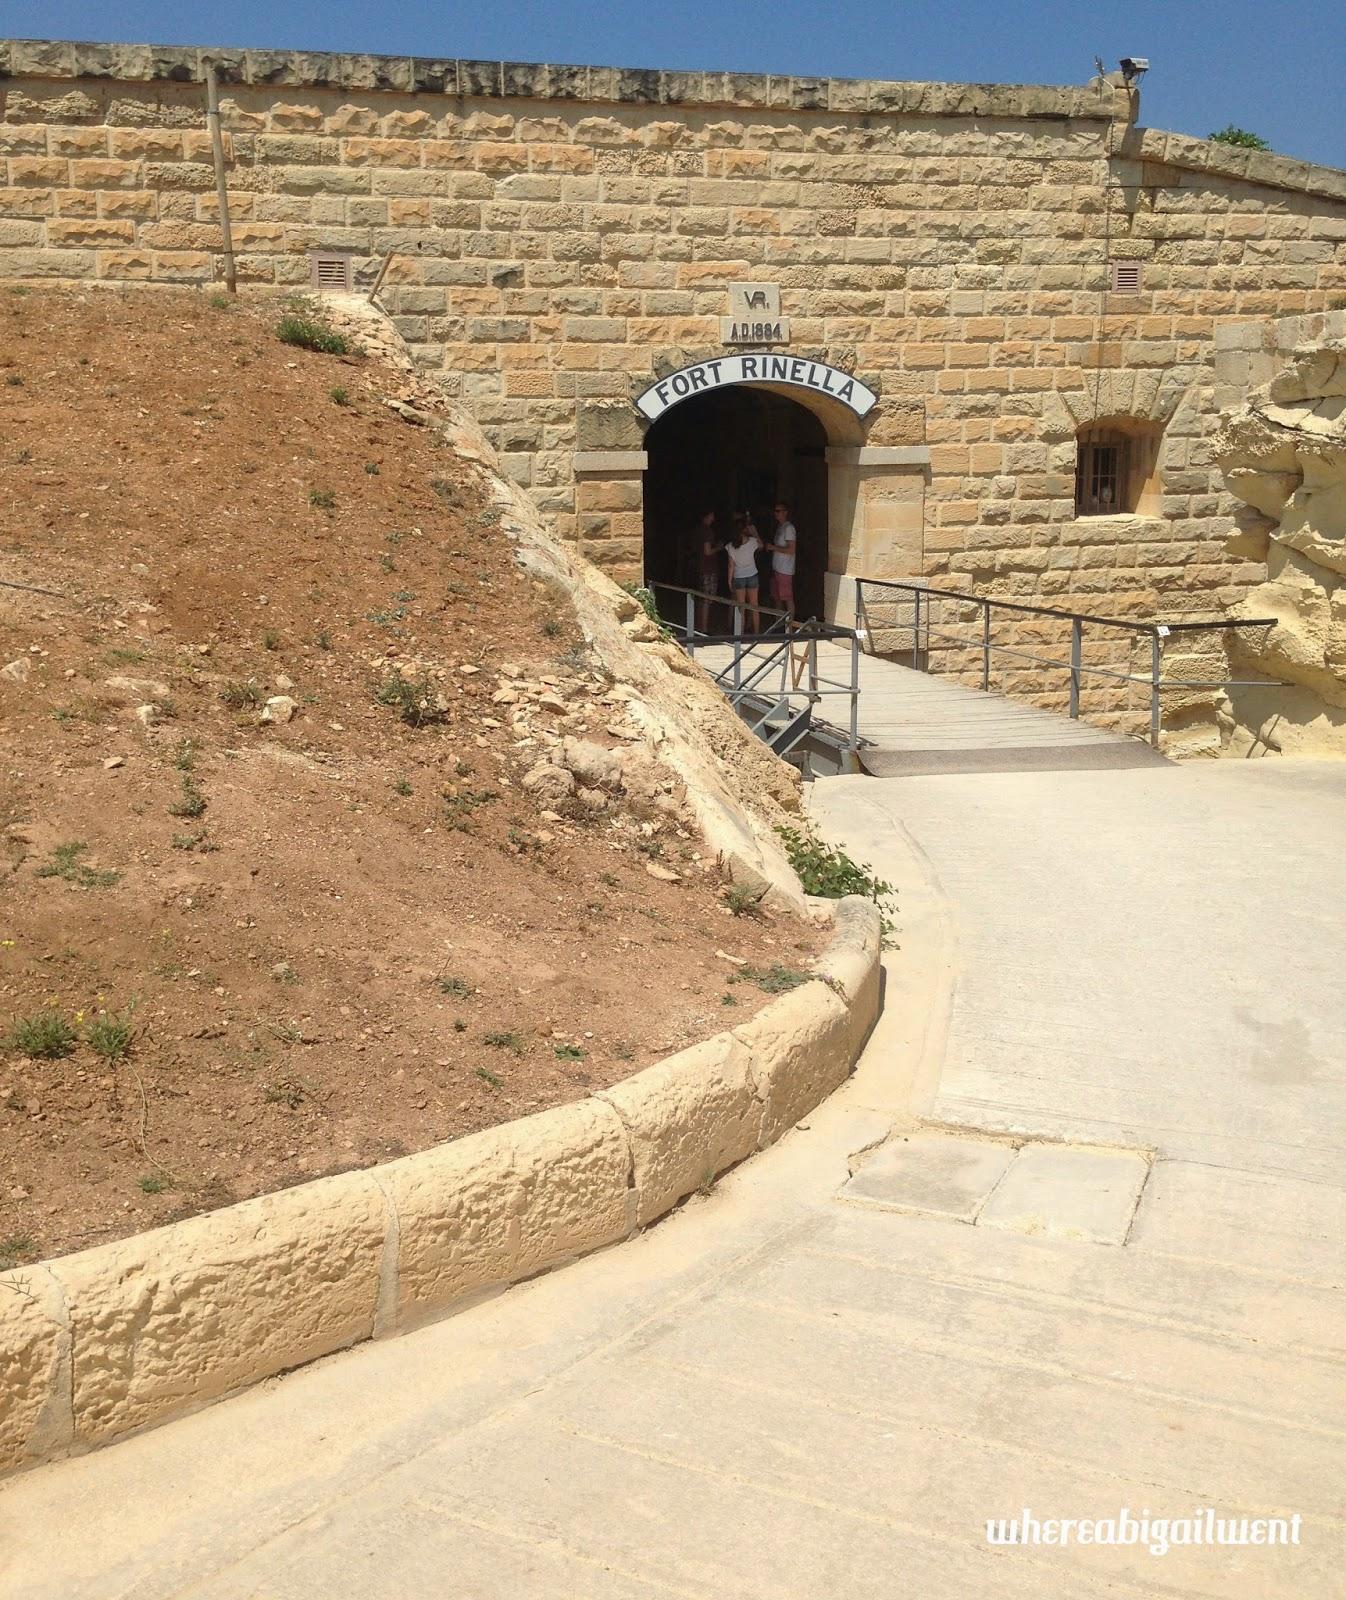 Fort Rinella Experience Malta